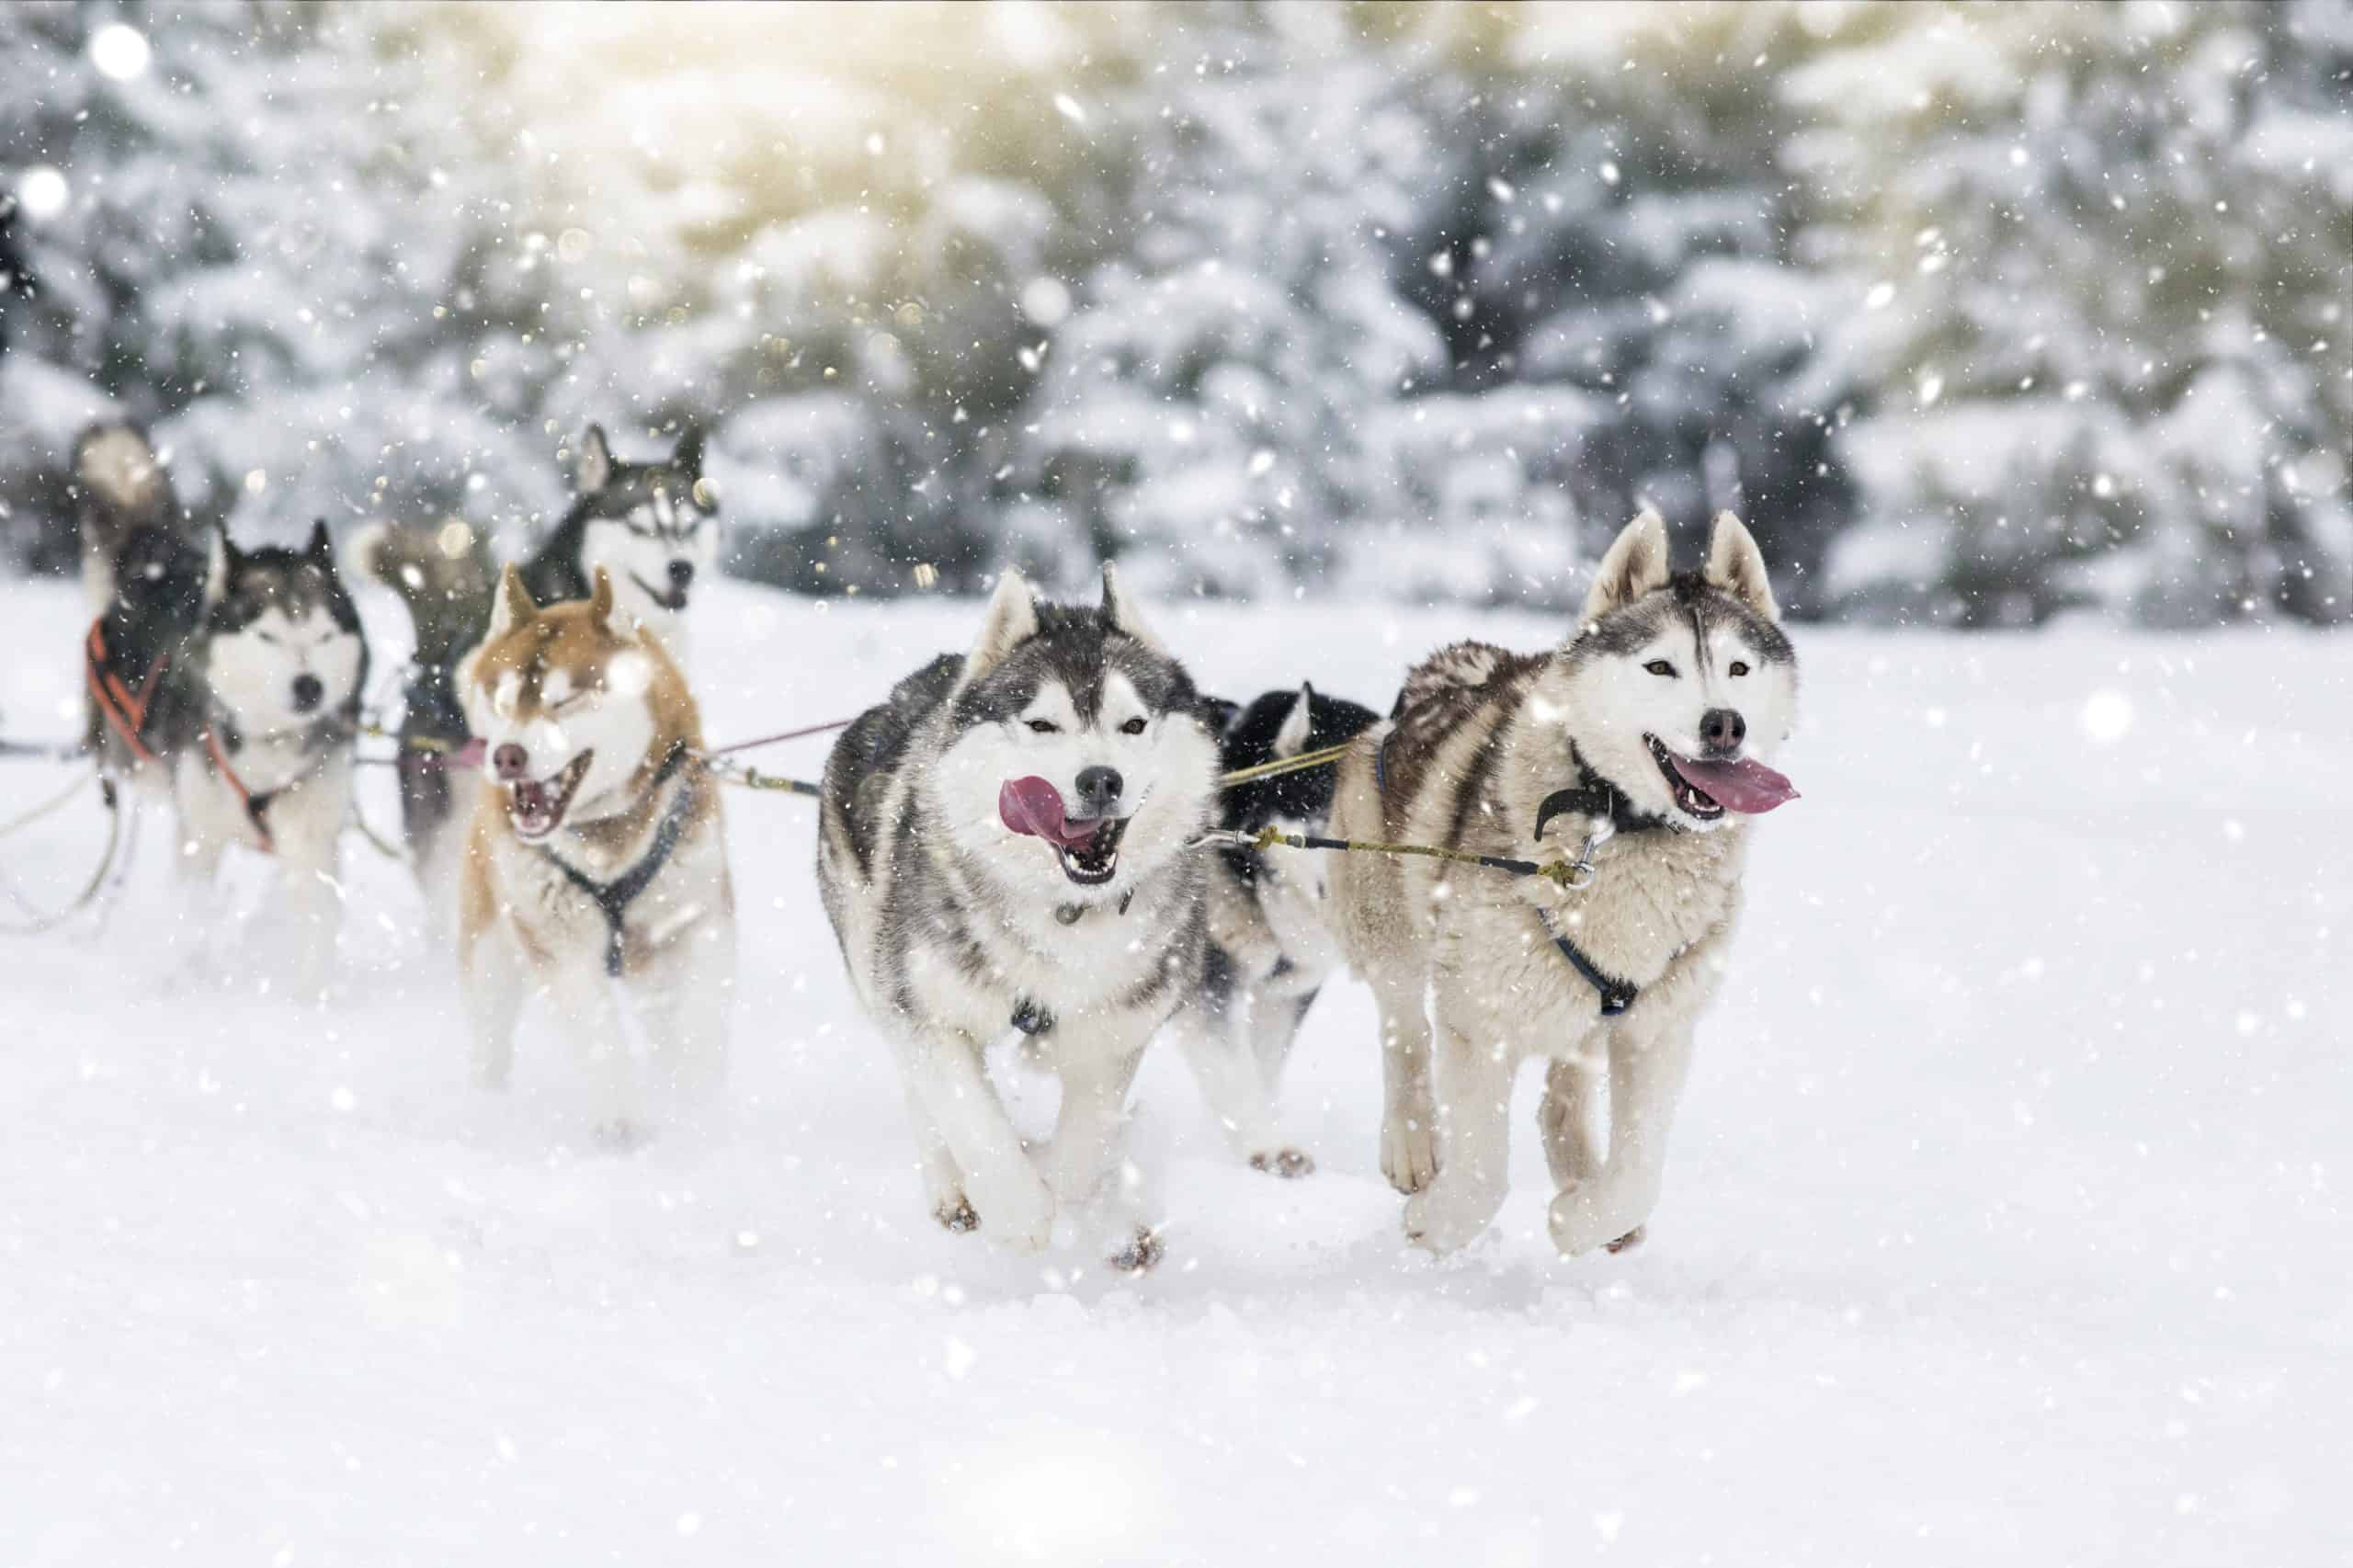 Alaskan Husky vs. Siberian Husky: Alaskan Huskies are more commonly used as sled dogs.